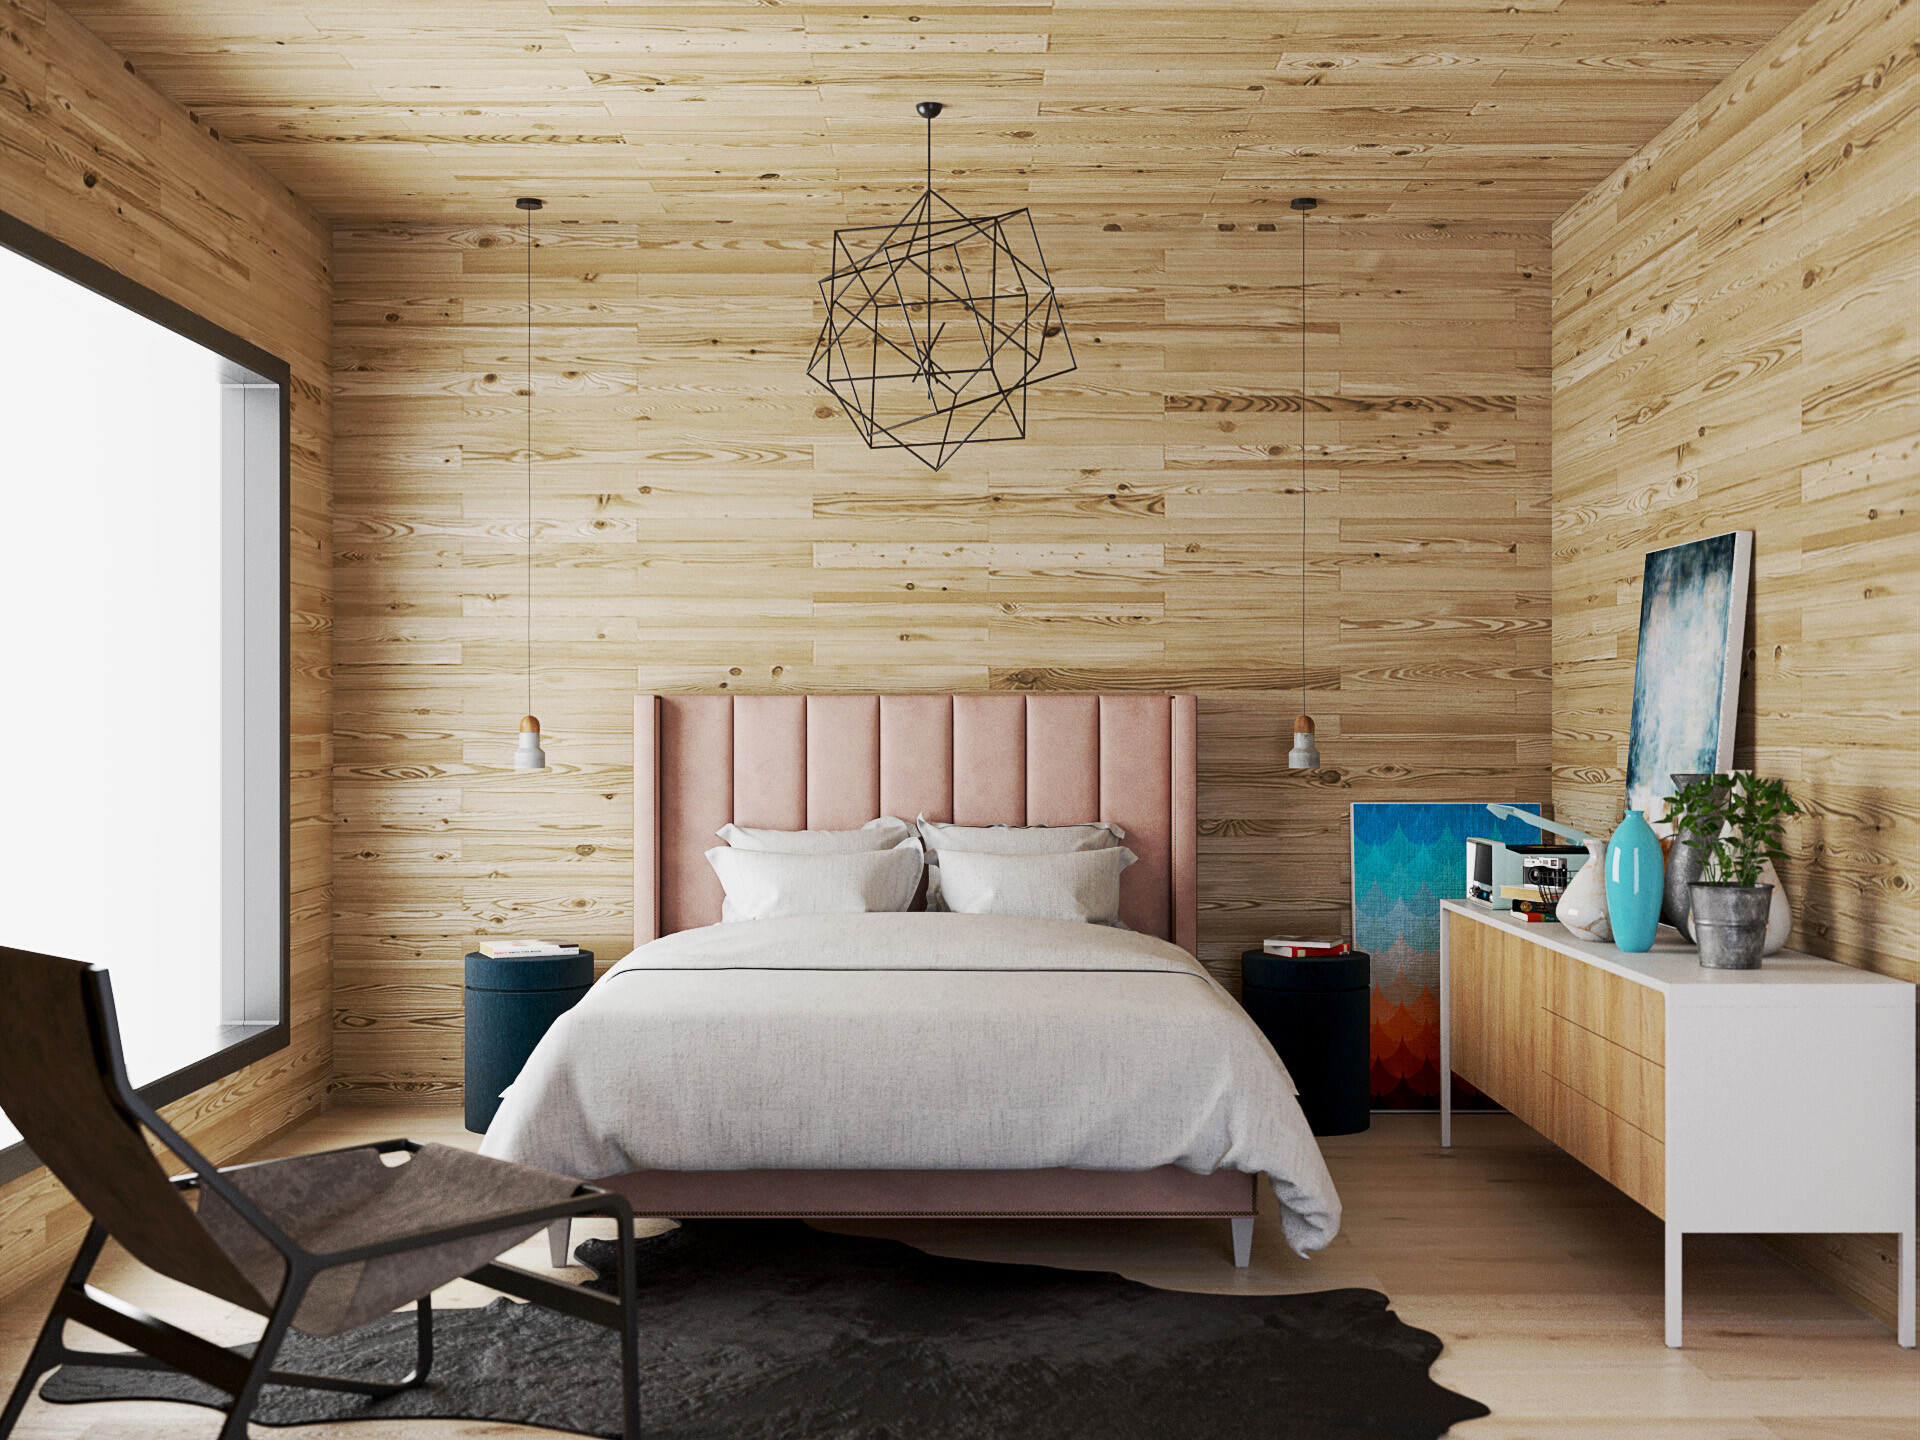 Distressed Wood Makes A Scandinavian Vibe